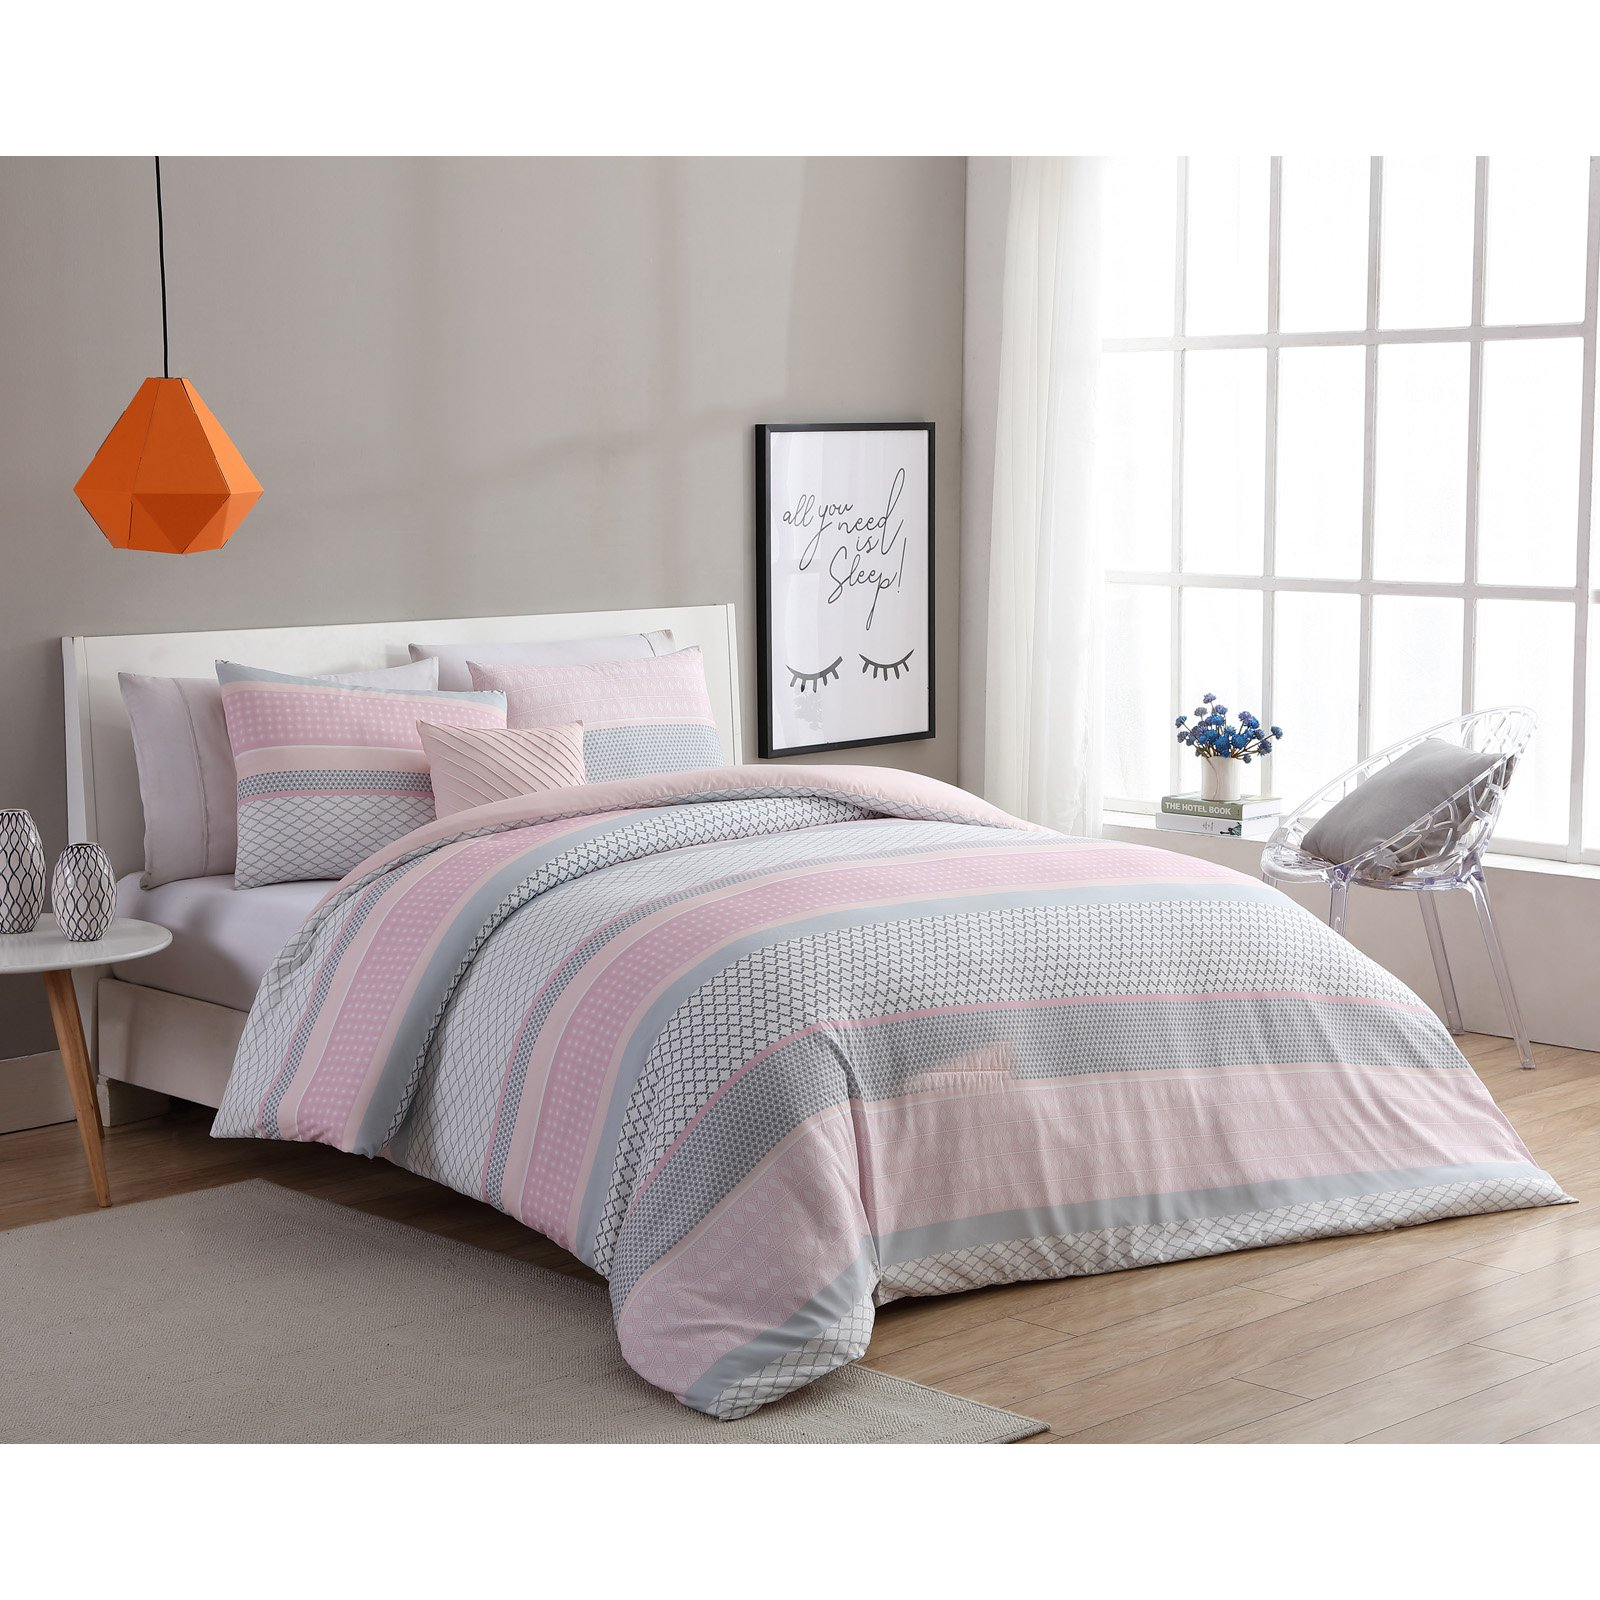 Vcny Home Light Pink Grey Stockholm 3 4 Piece Comforter Bedding Set Shams And Decorative Pillow Included Walmart Com Walmart Com